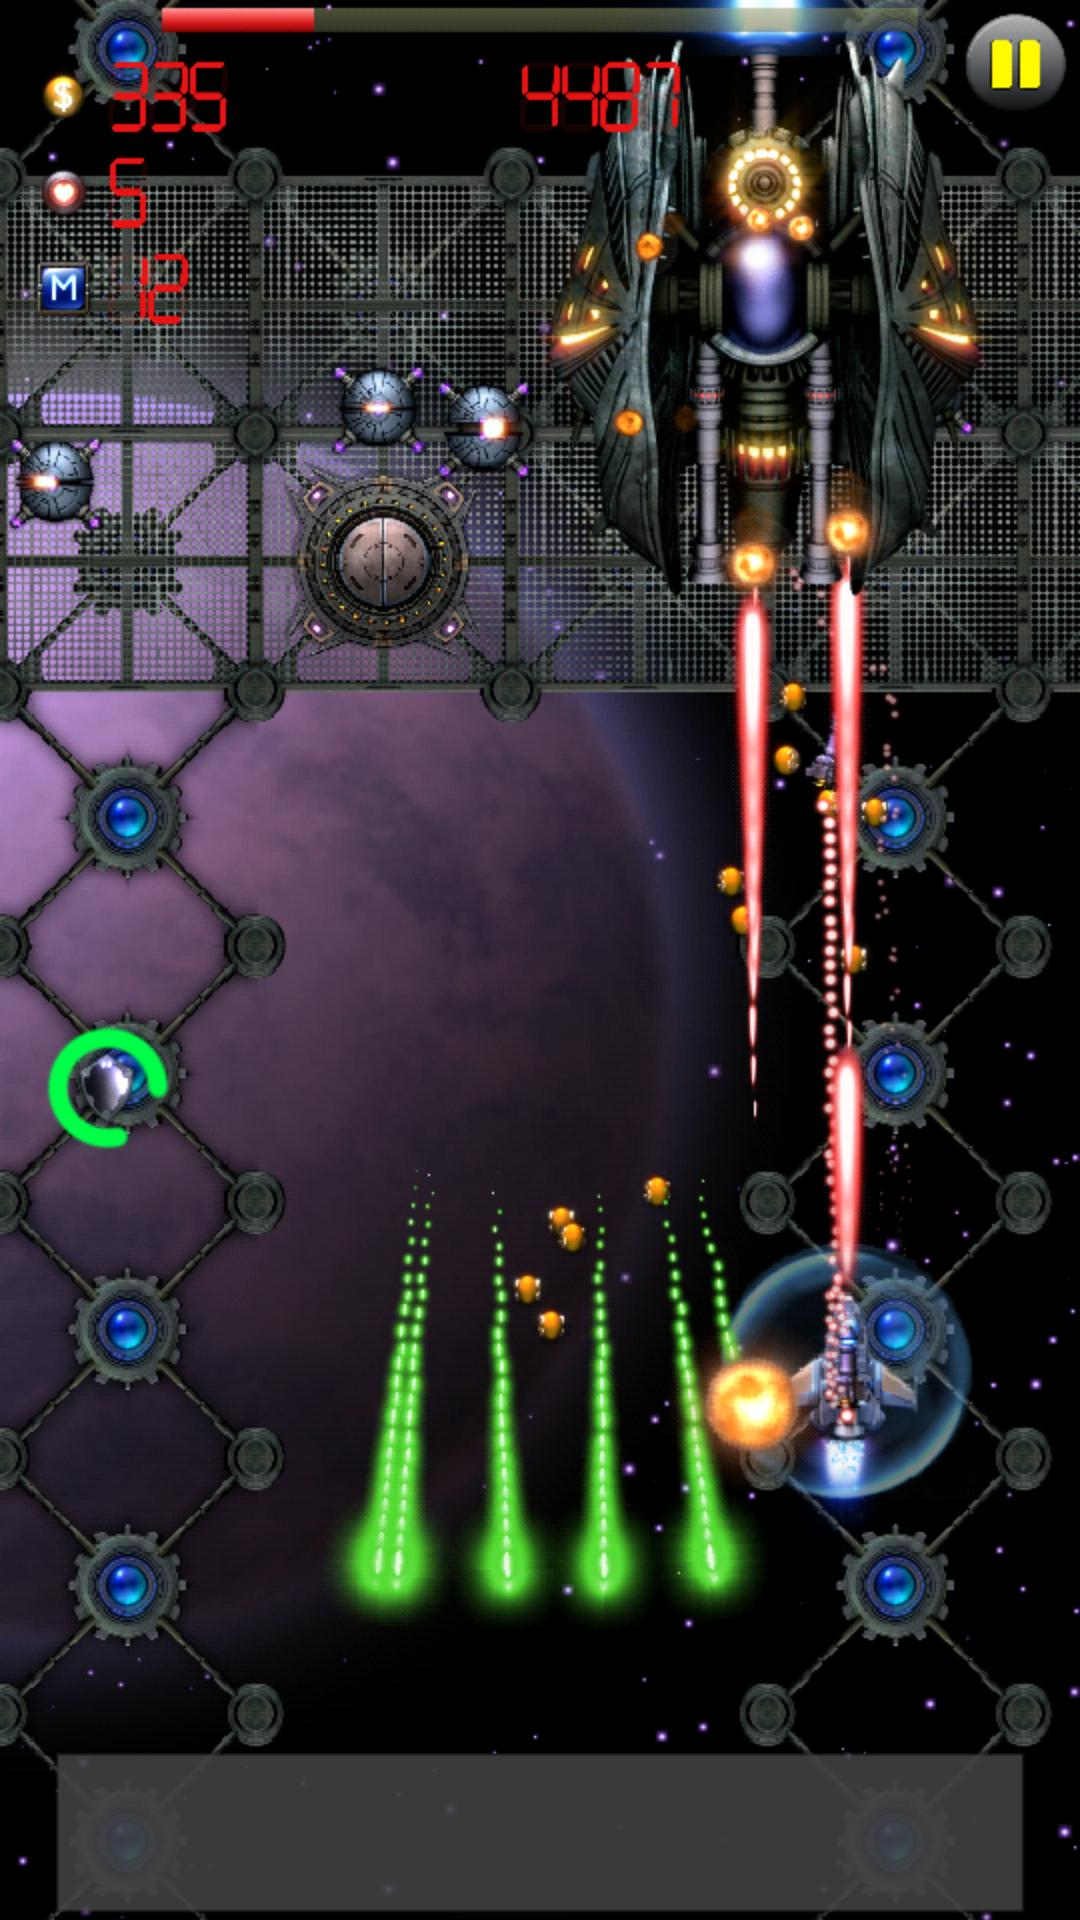 Galaxy Patrol Space Shooter 1.0 Screenshot 7